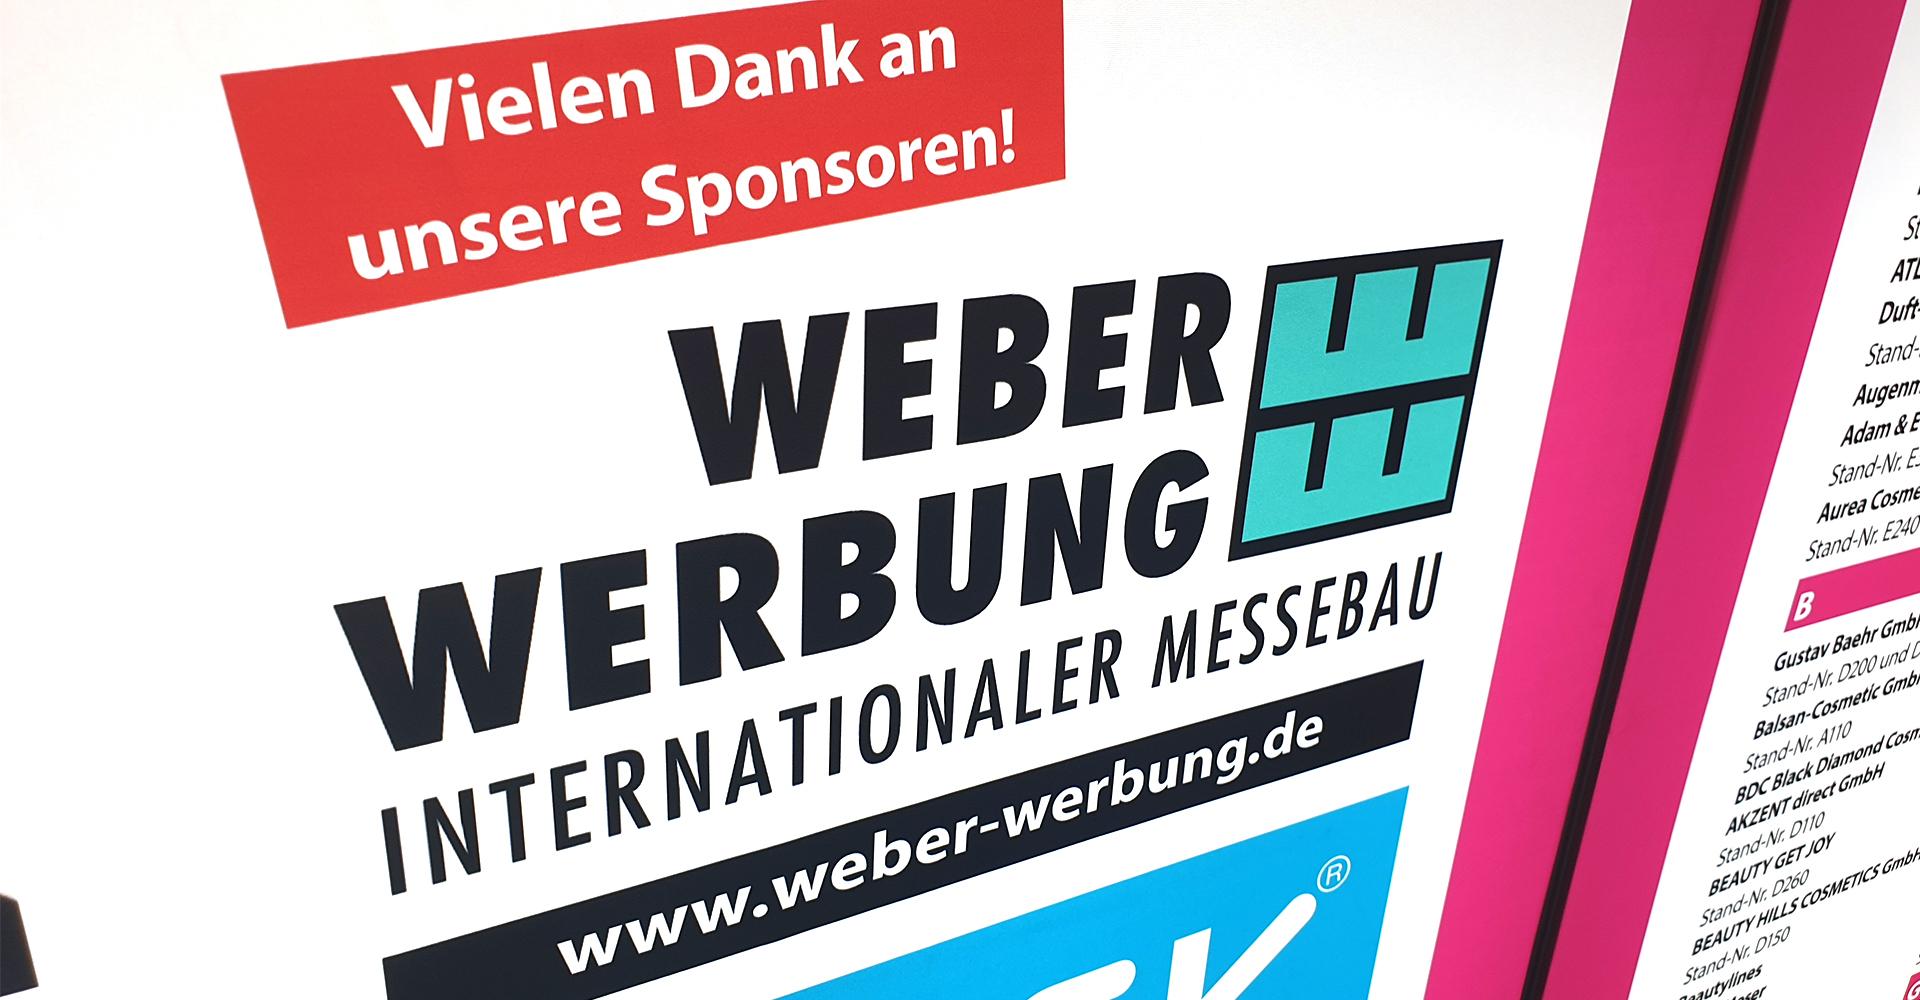 Cosmetica Hannover Messebau Delligsen ALfeld Sponsor